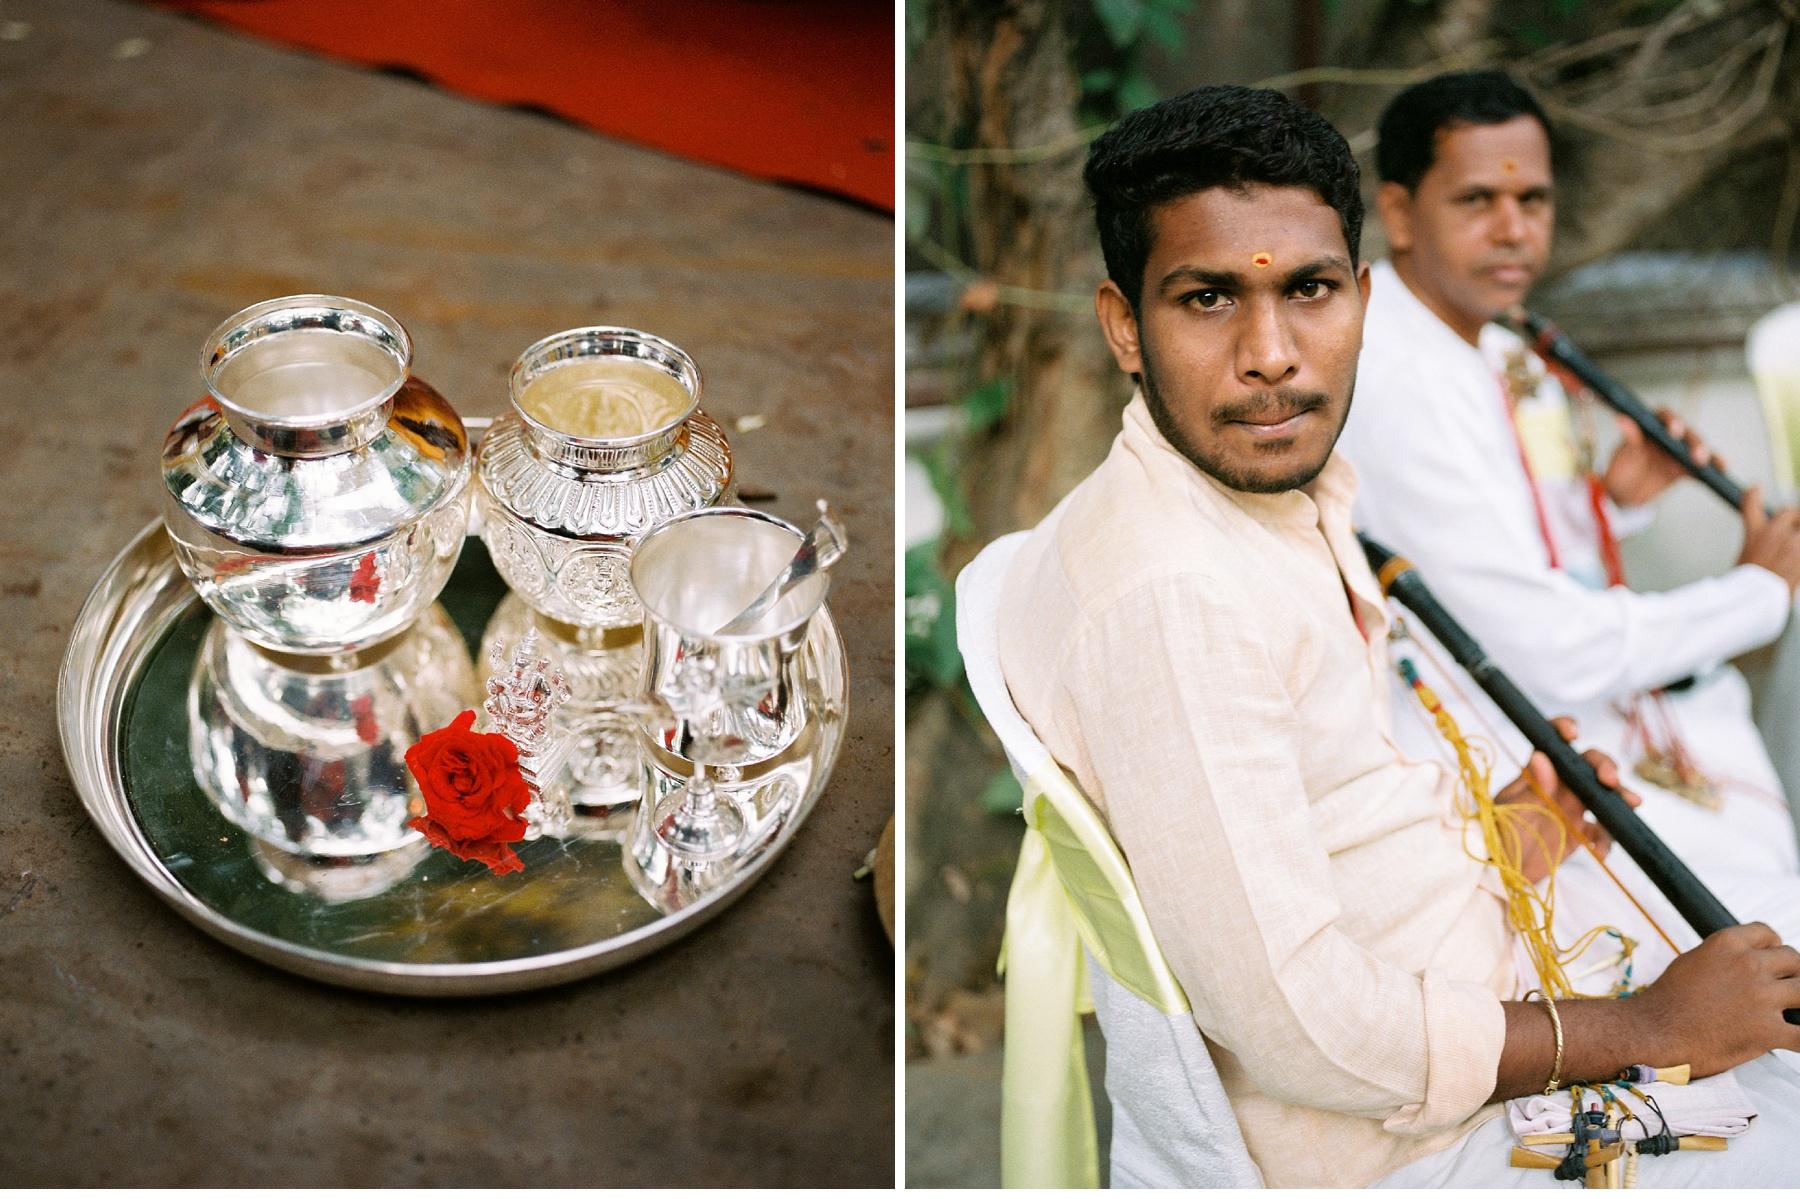 Southern_India_Wedding_Ceremony_0003.jpg